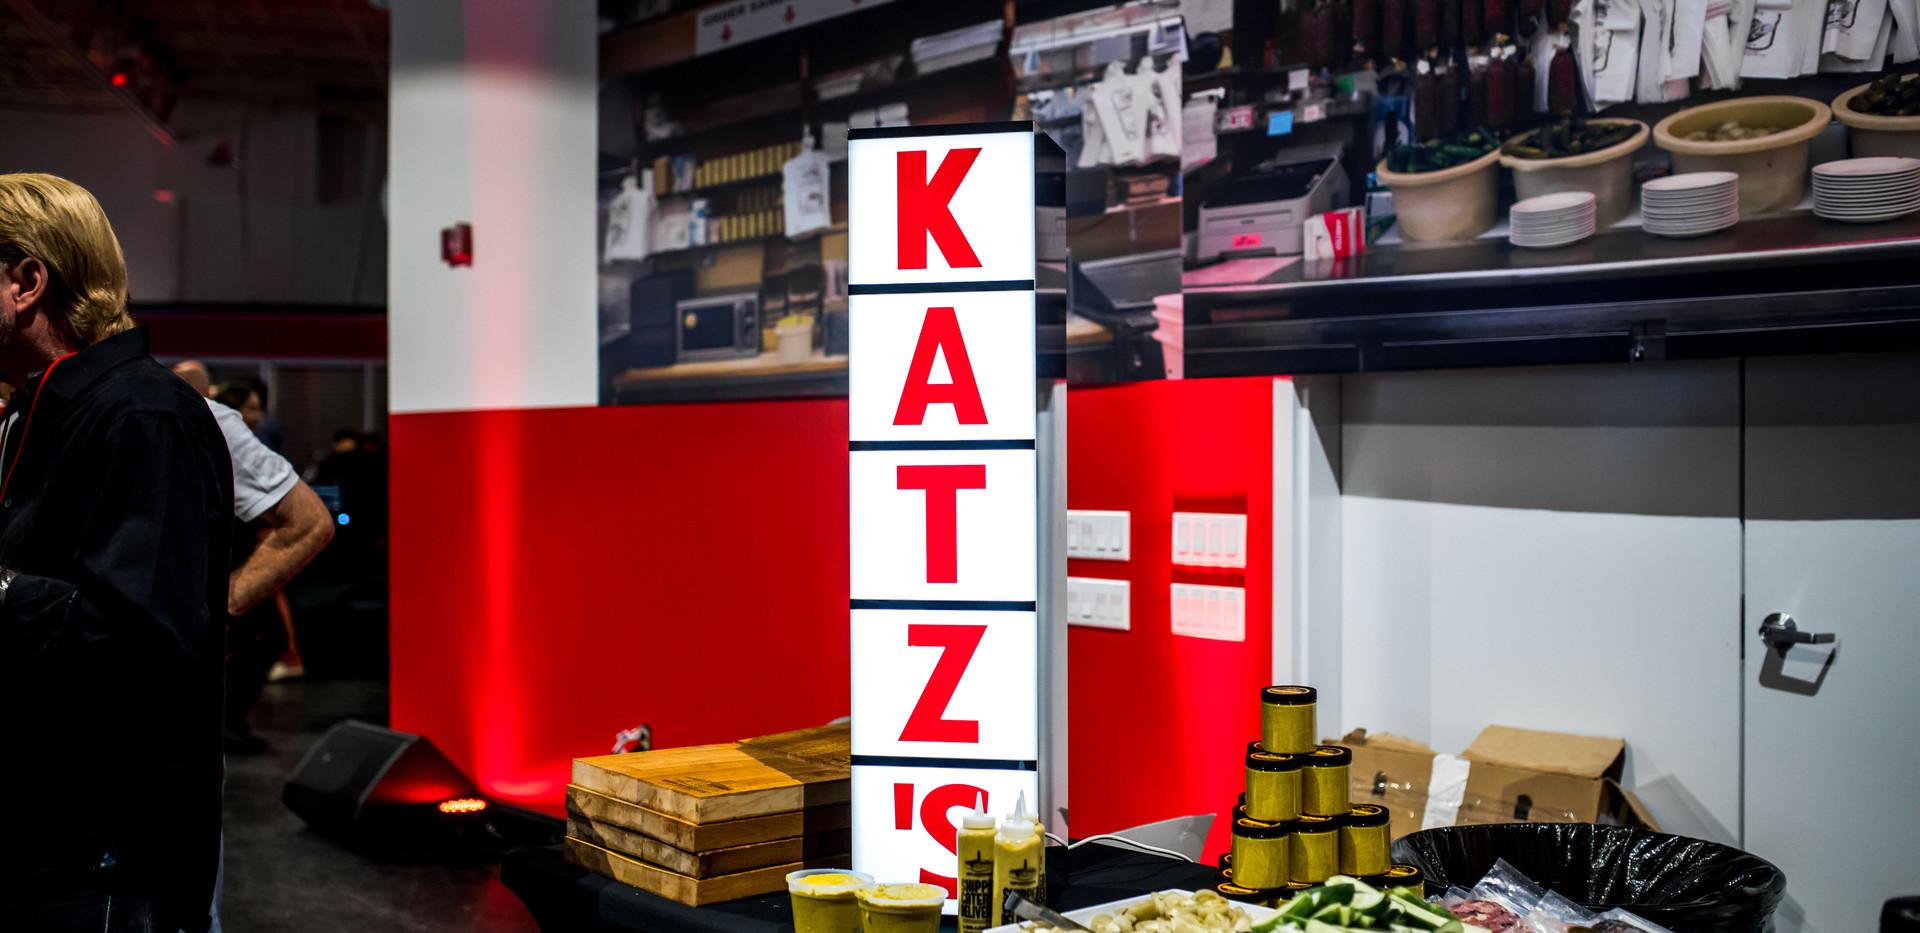 Katzs-2.jpg